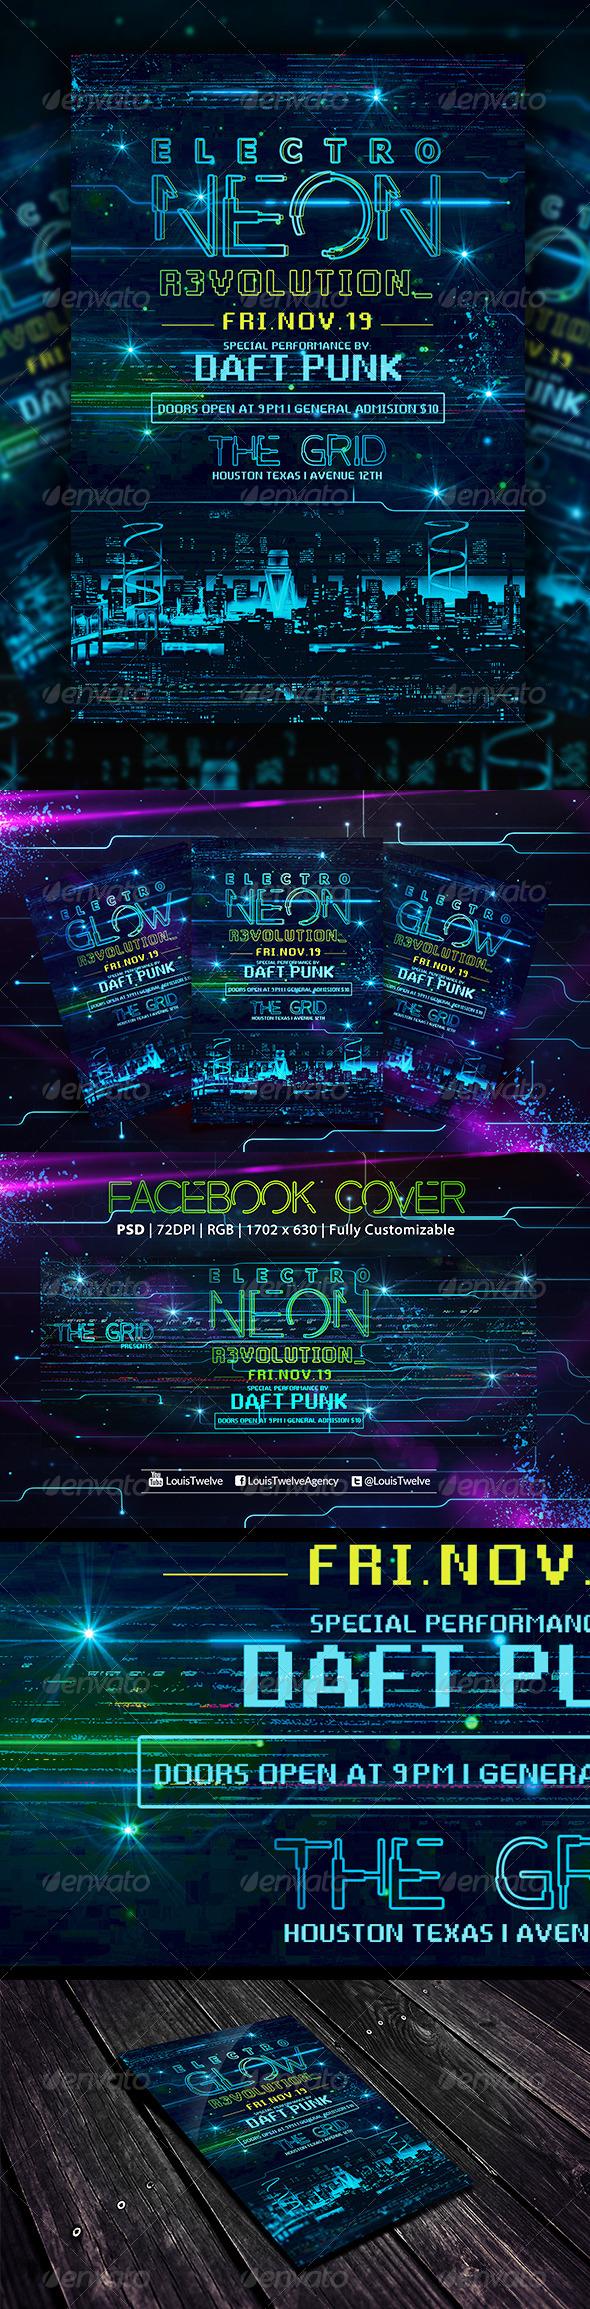 GraphicRiver Electro Neon Flyer & Fb Cover 5928420